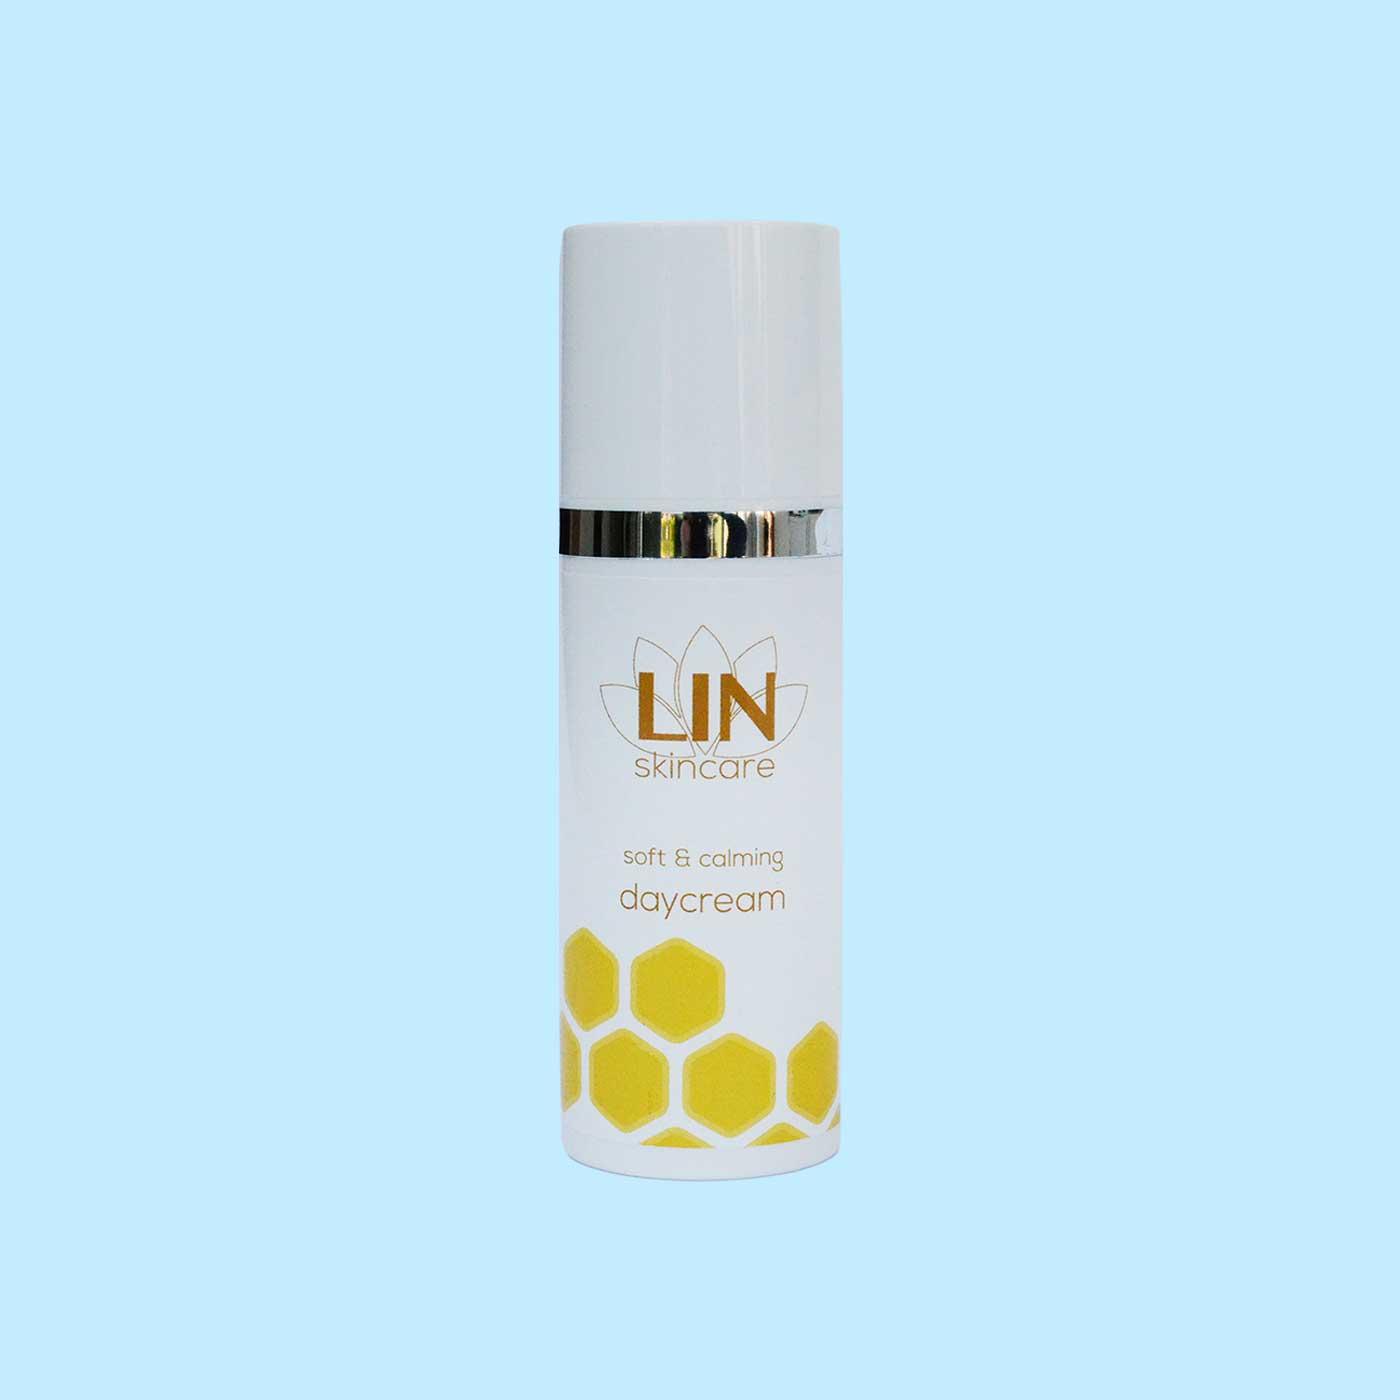 Ervaar de kalmerende dagcrème van LIN Skincare.